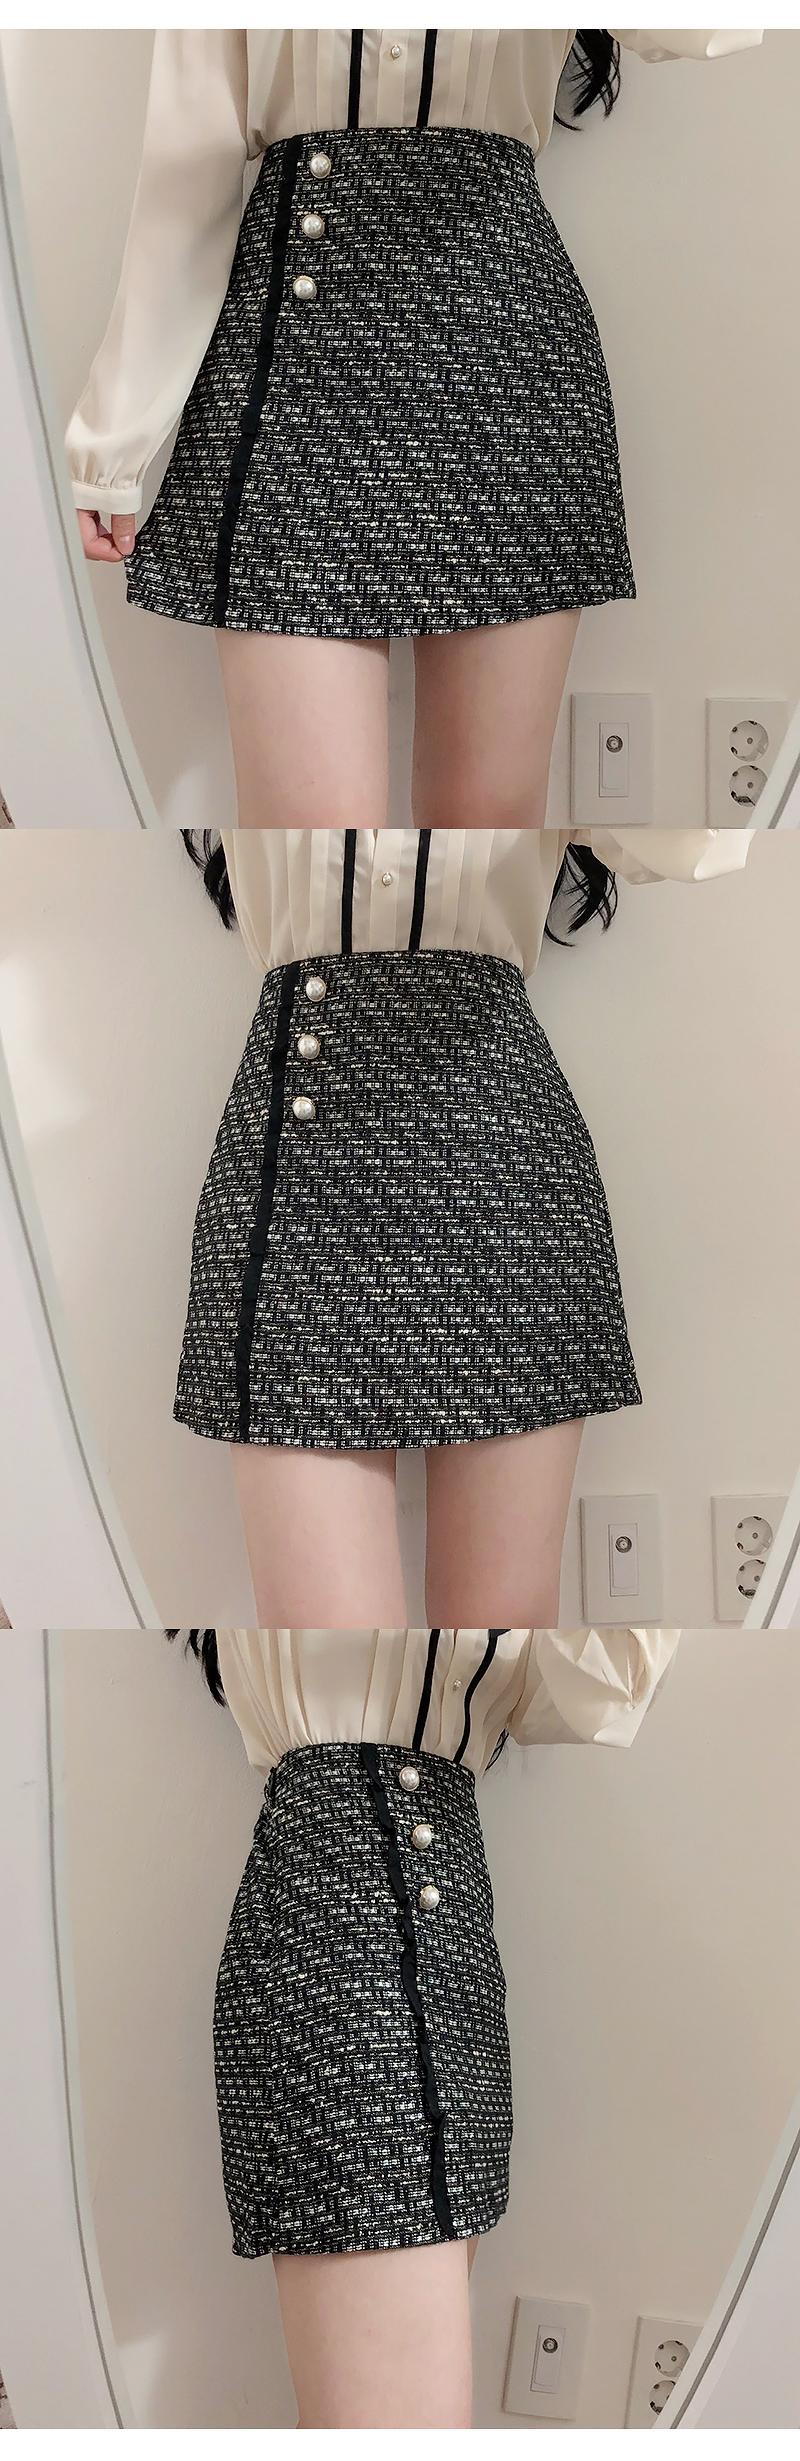 Broochset ♥ Abel pin tuck blouse